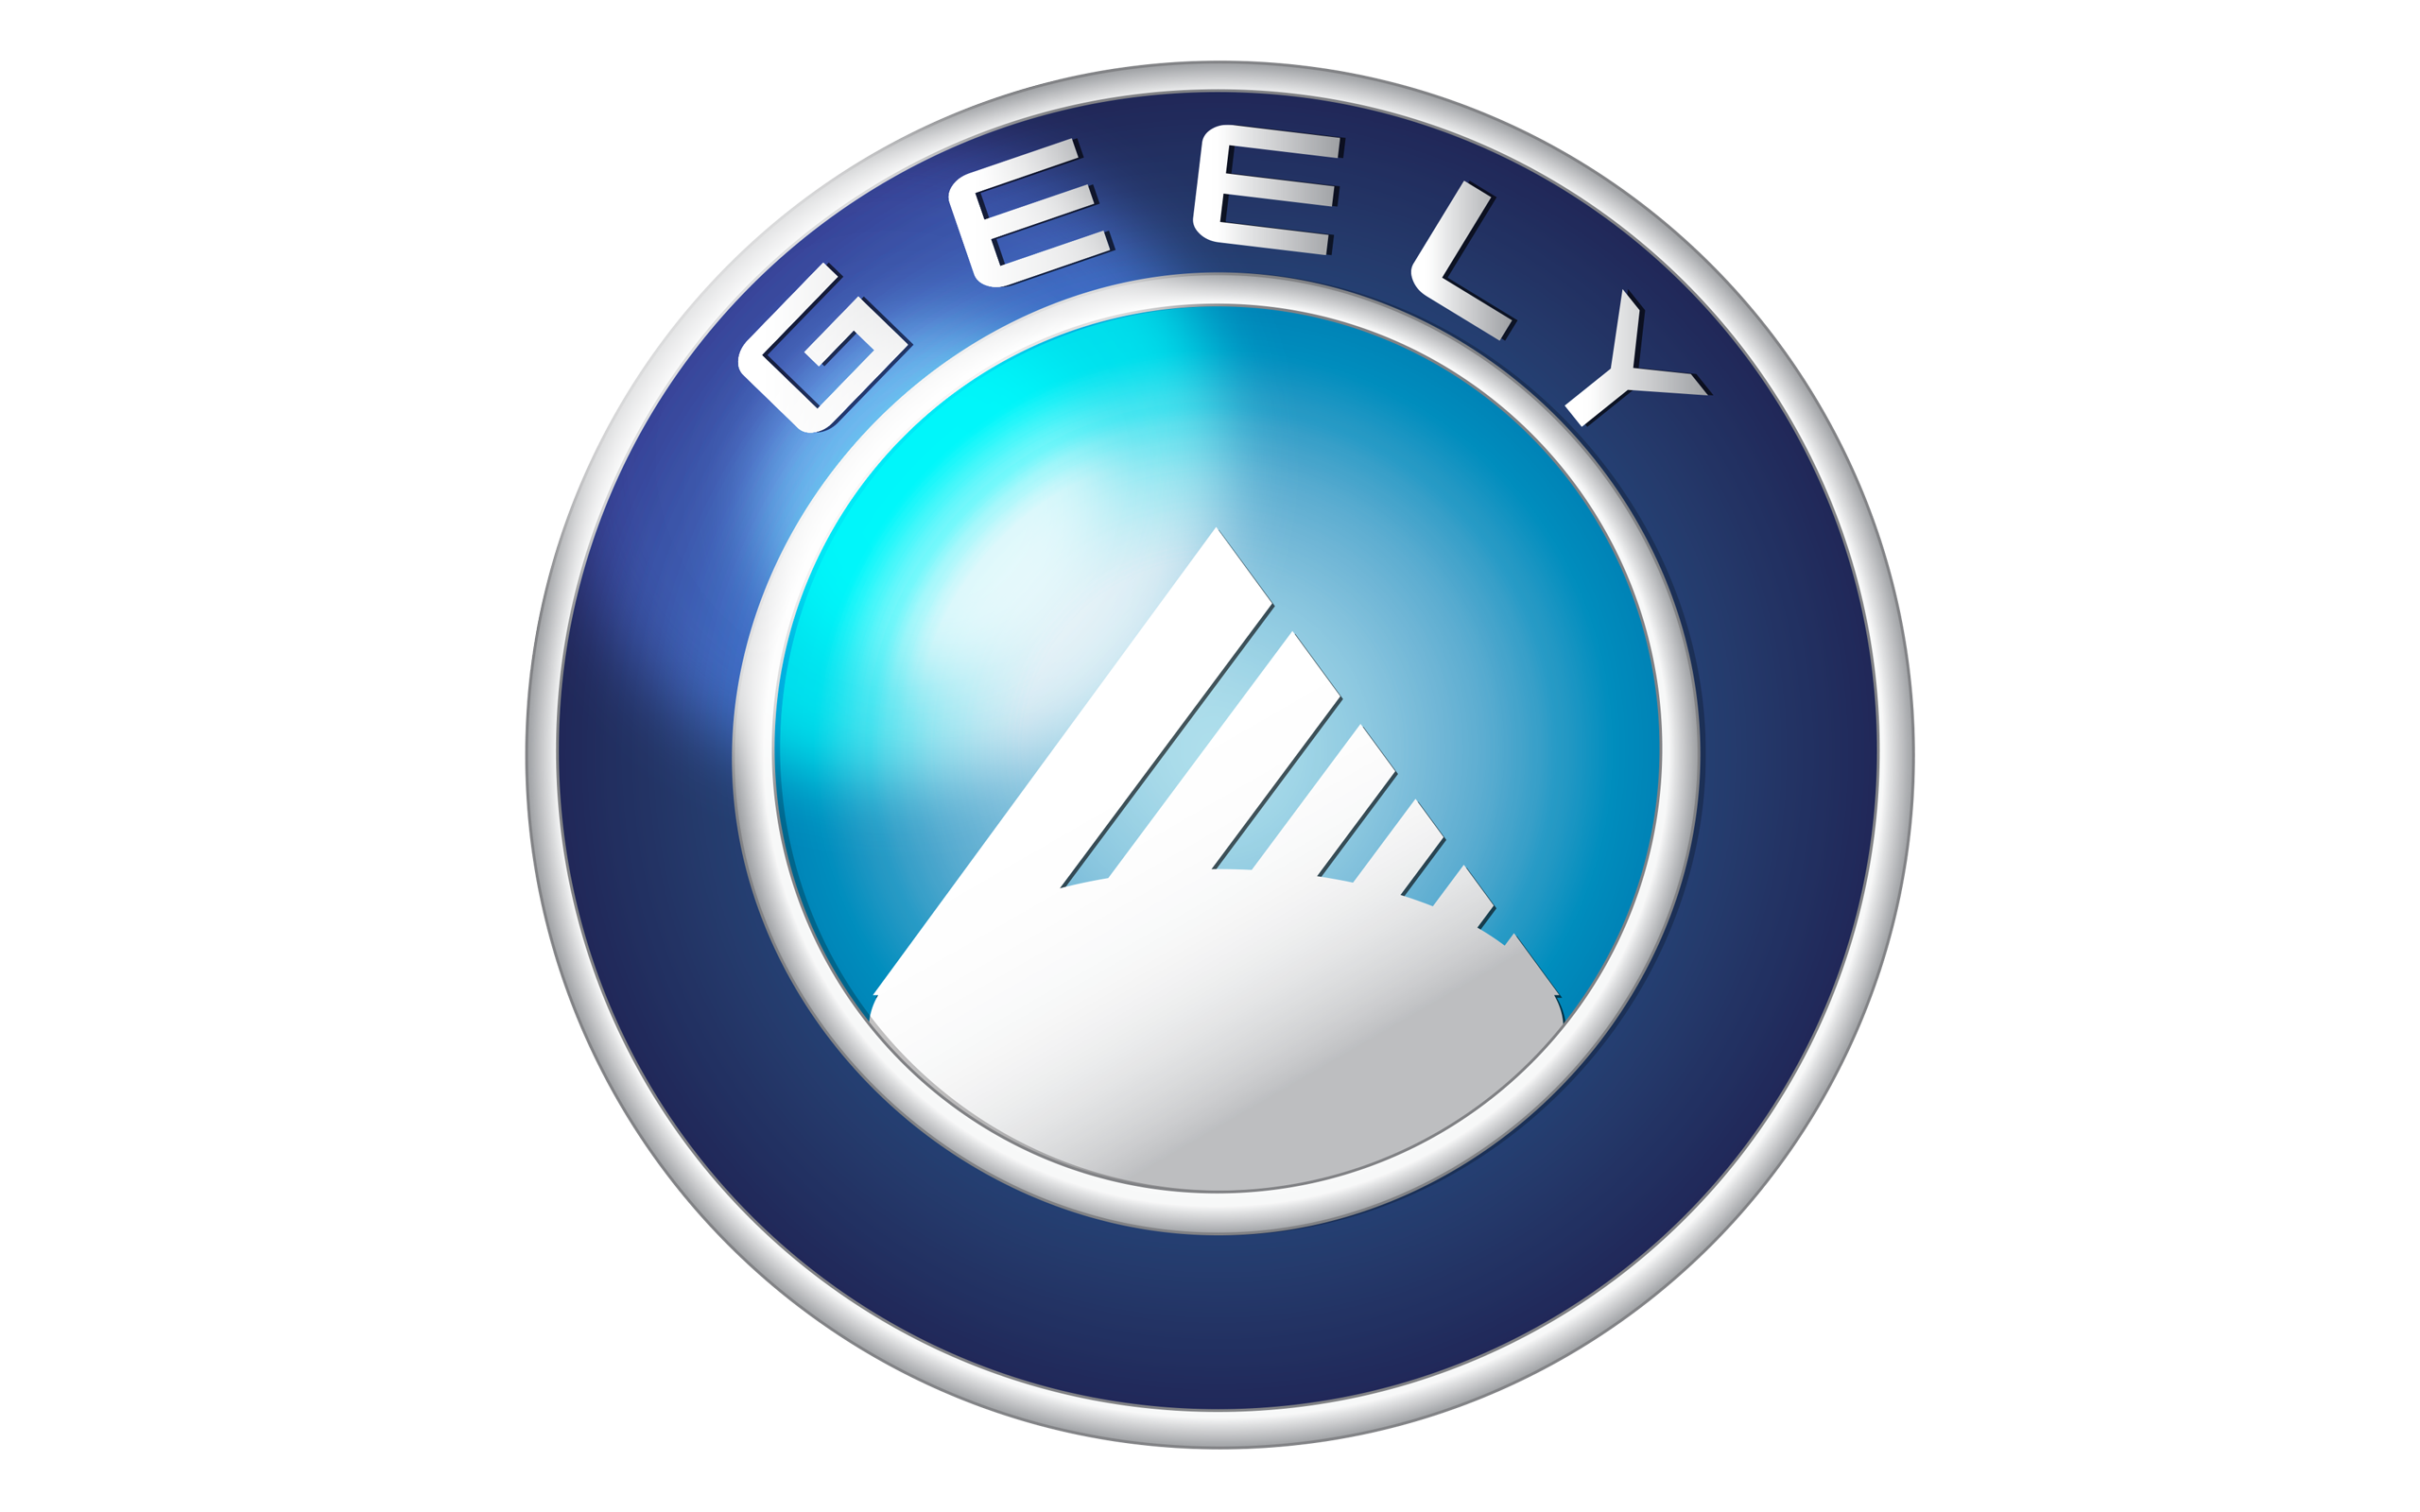 2 août 2010: Geely devient propriétaire de Volvo